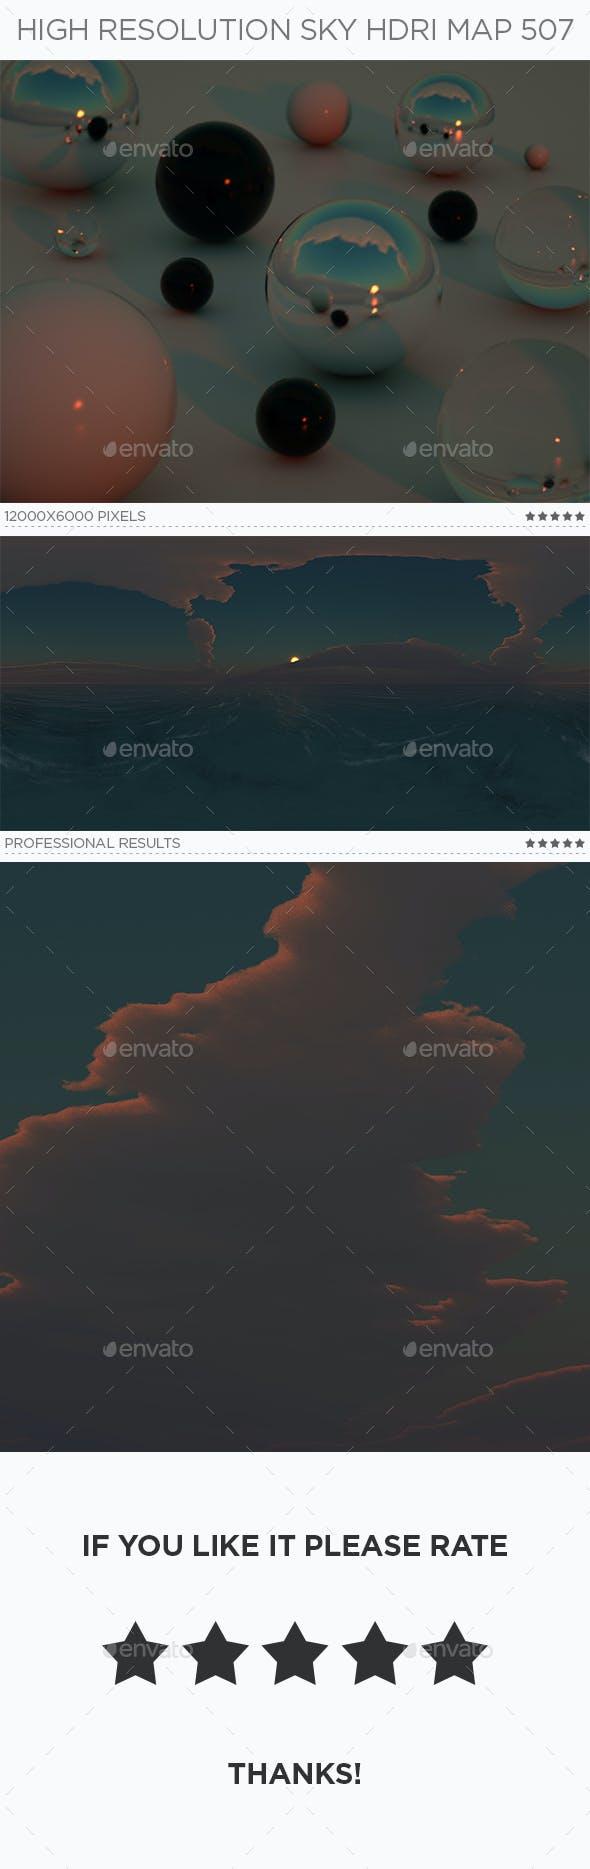 High Resolution Sky HDRi Map 507 - 3DOcean Item for Sale